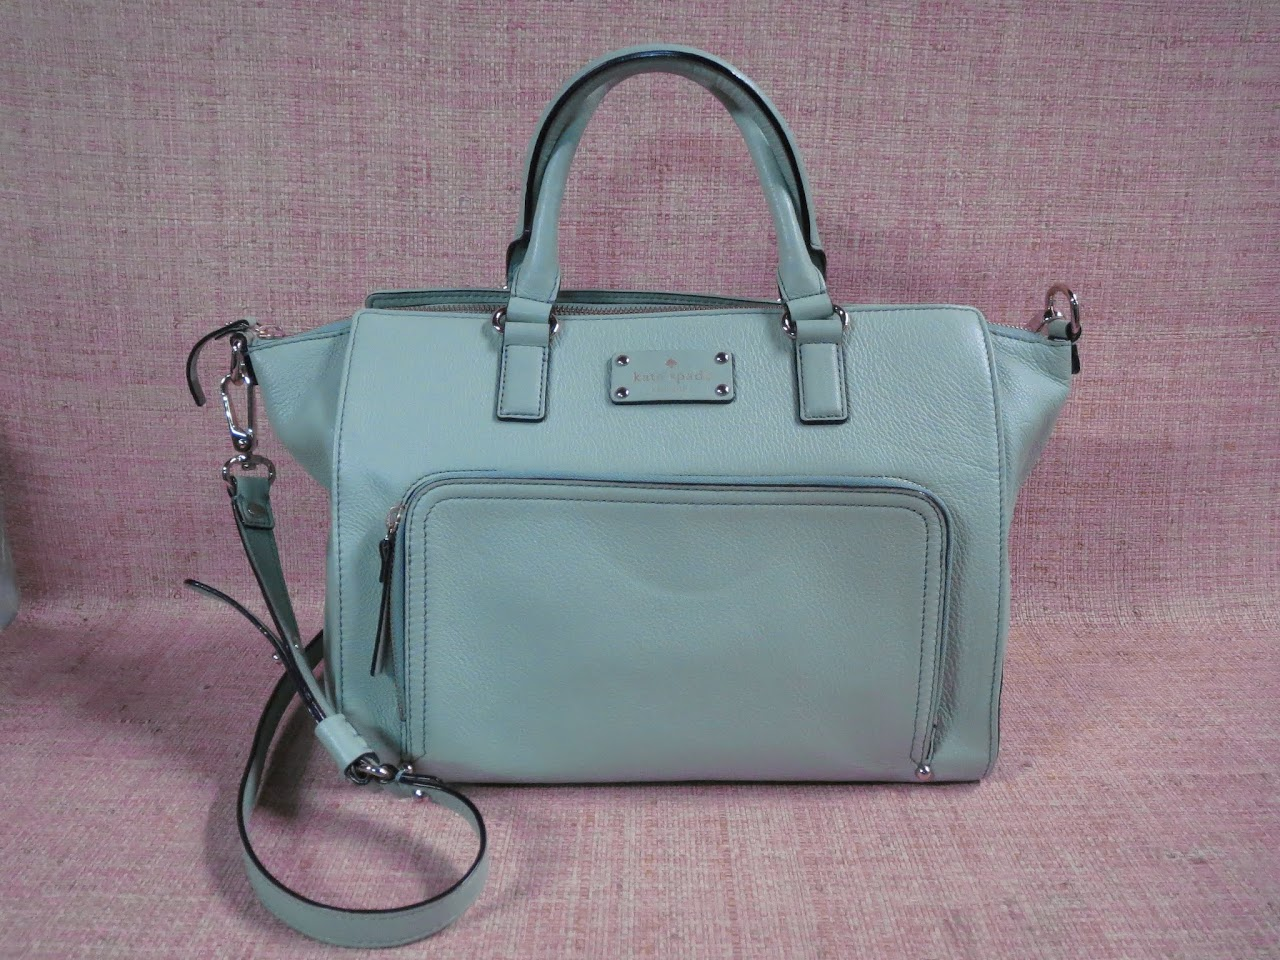 Kate Spade Seafoam Crossbody Bag